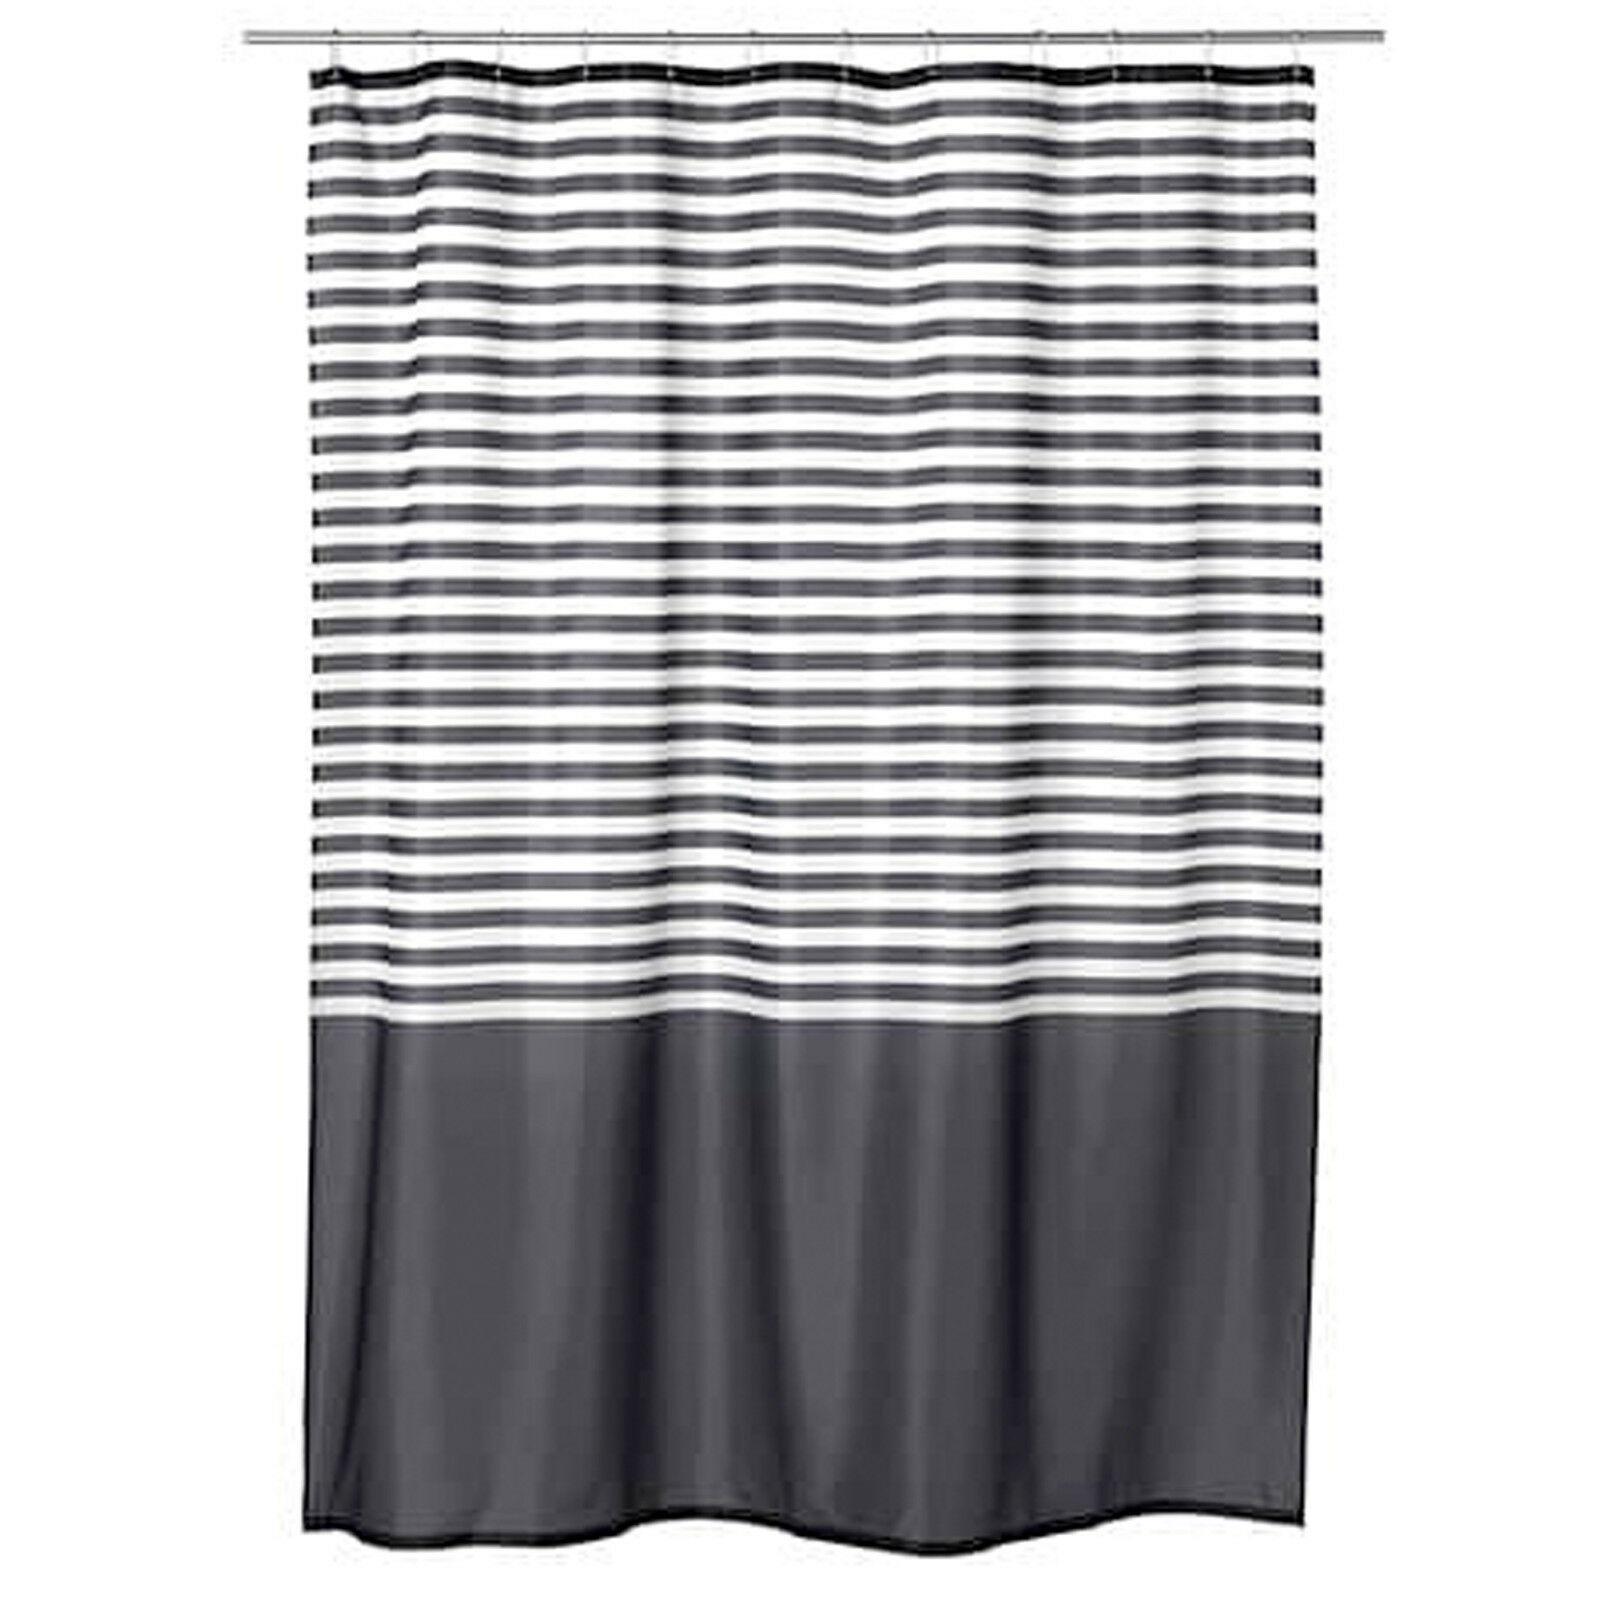 IKEA VADSJÖN Duschvorhang Vorhang Dusche Bad Badewannenvorhang 180x200 cm  grau